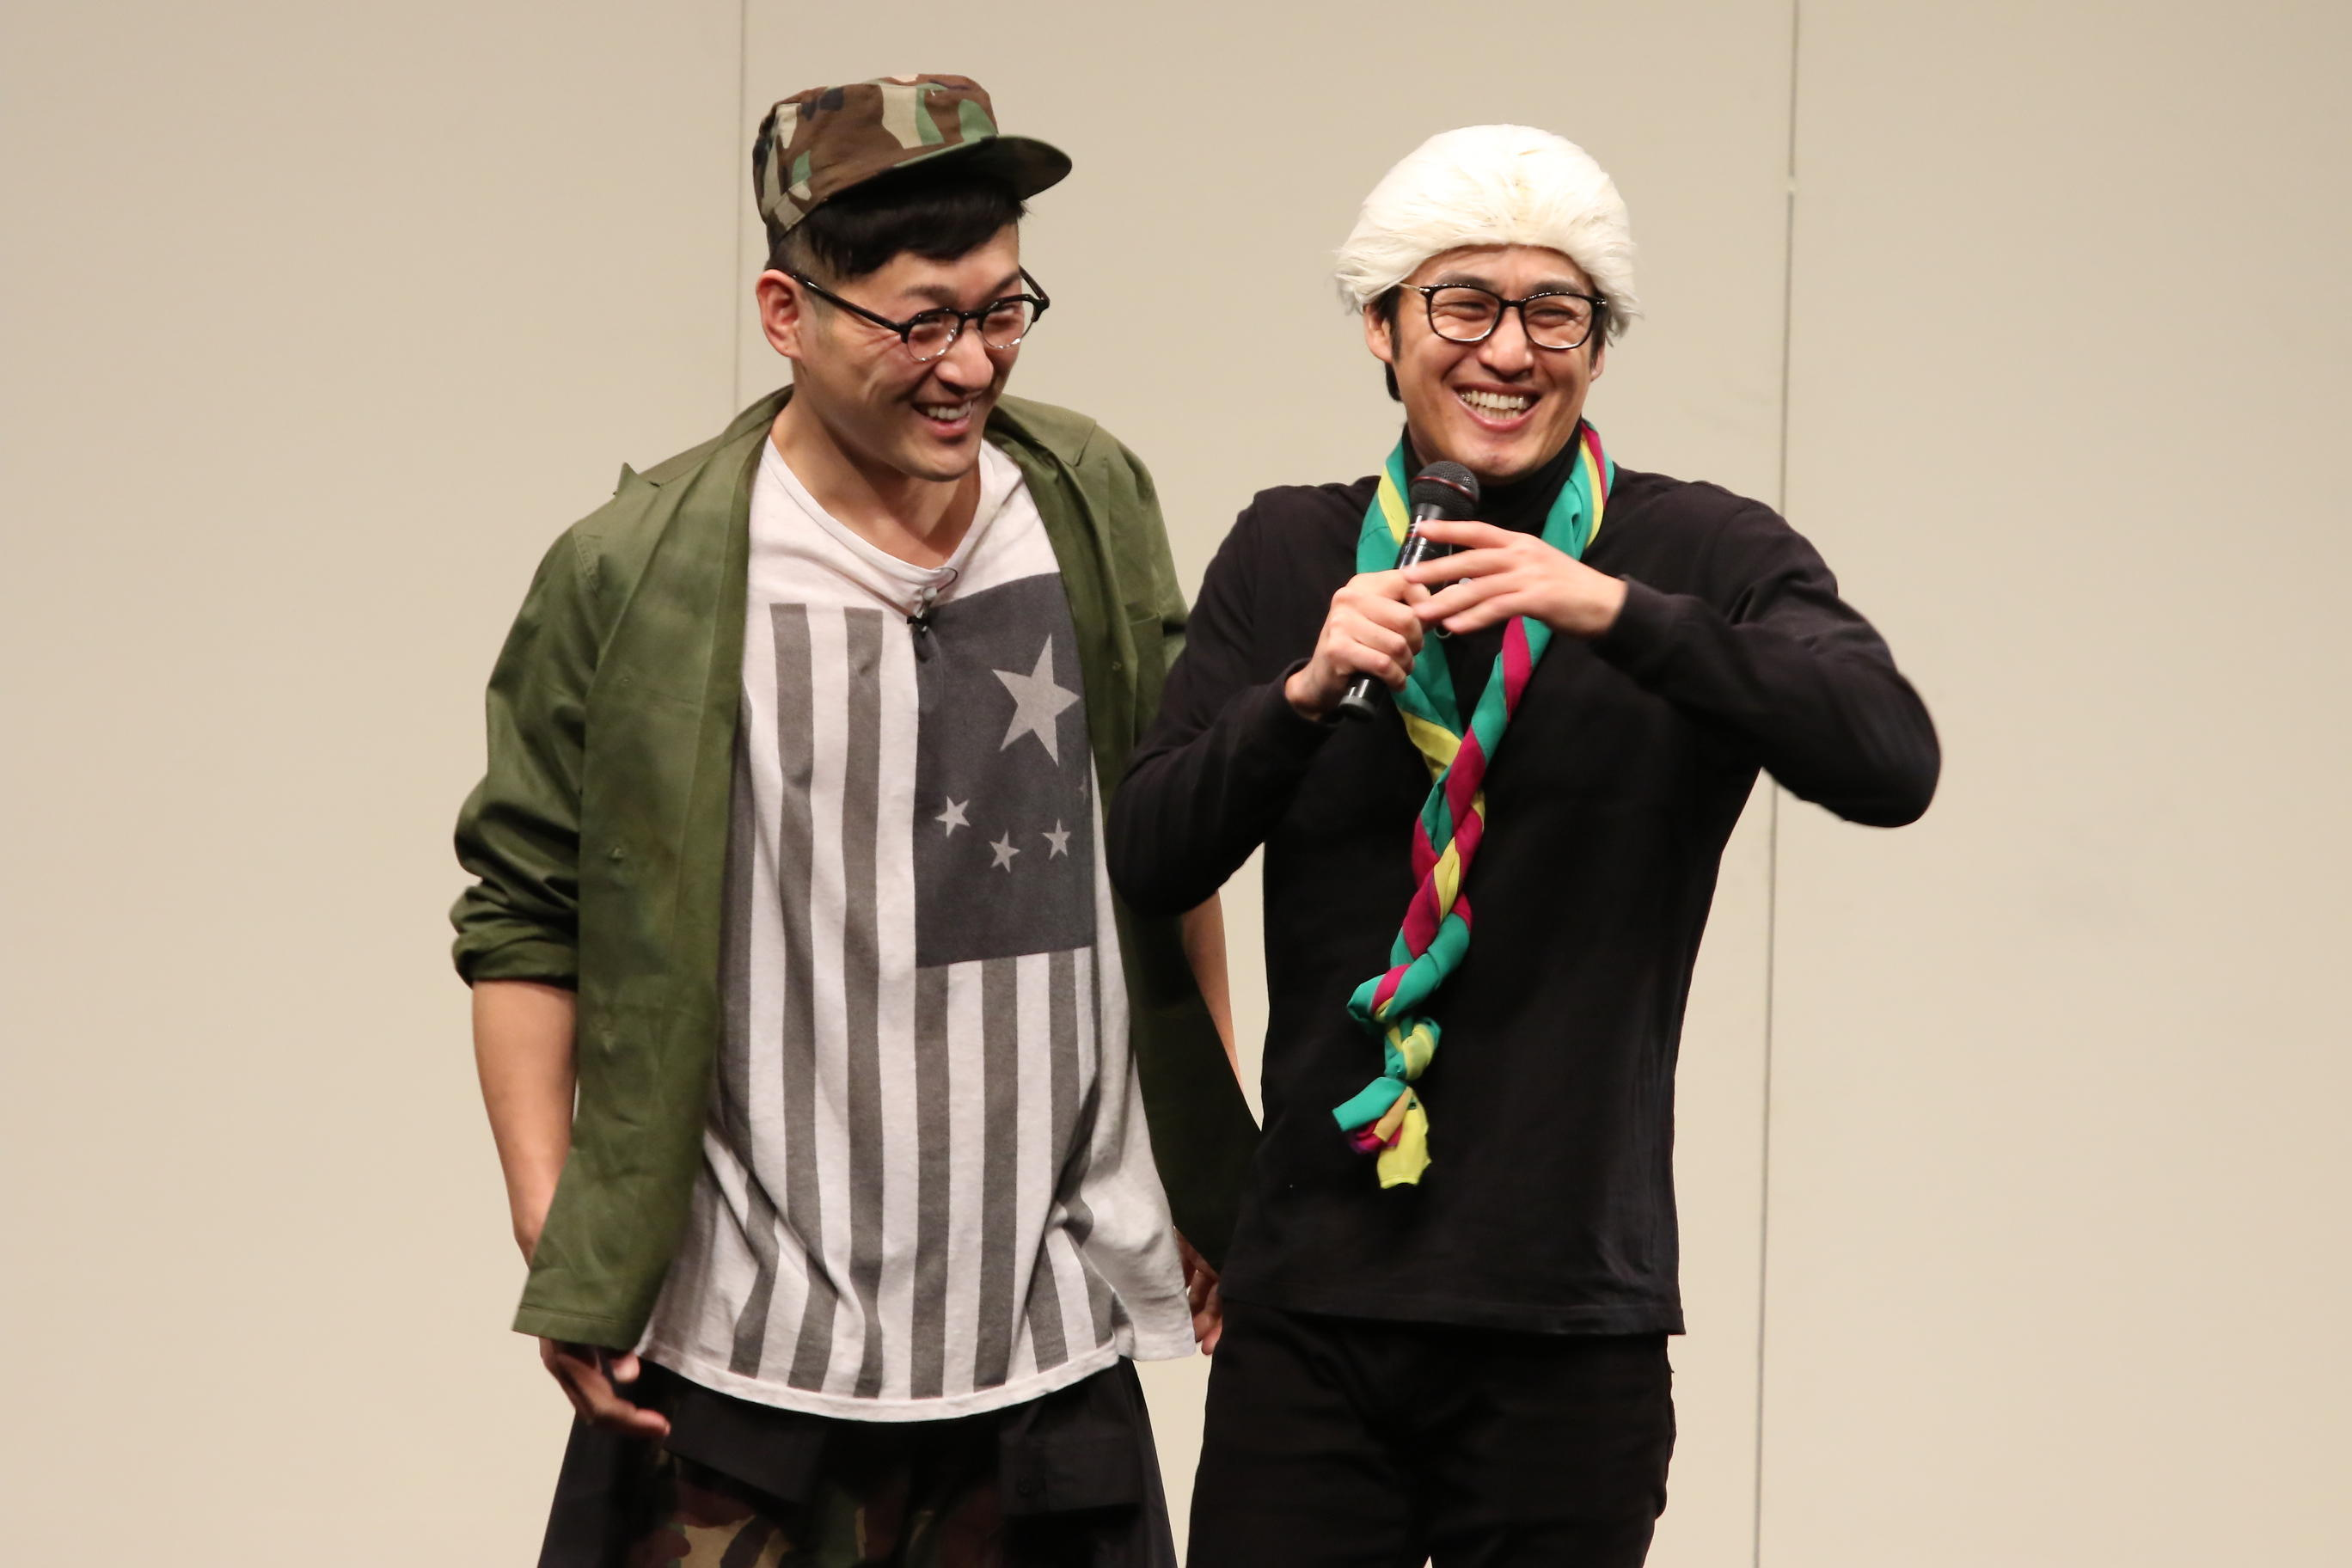 http://news.yoshimoto.co.jp/20190111102047-52c8a4848b6f9f14d5f3b3bf8c05f2133cc87c70.jpg